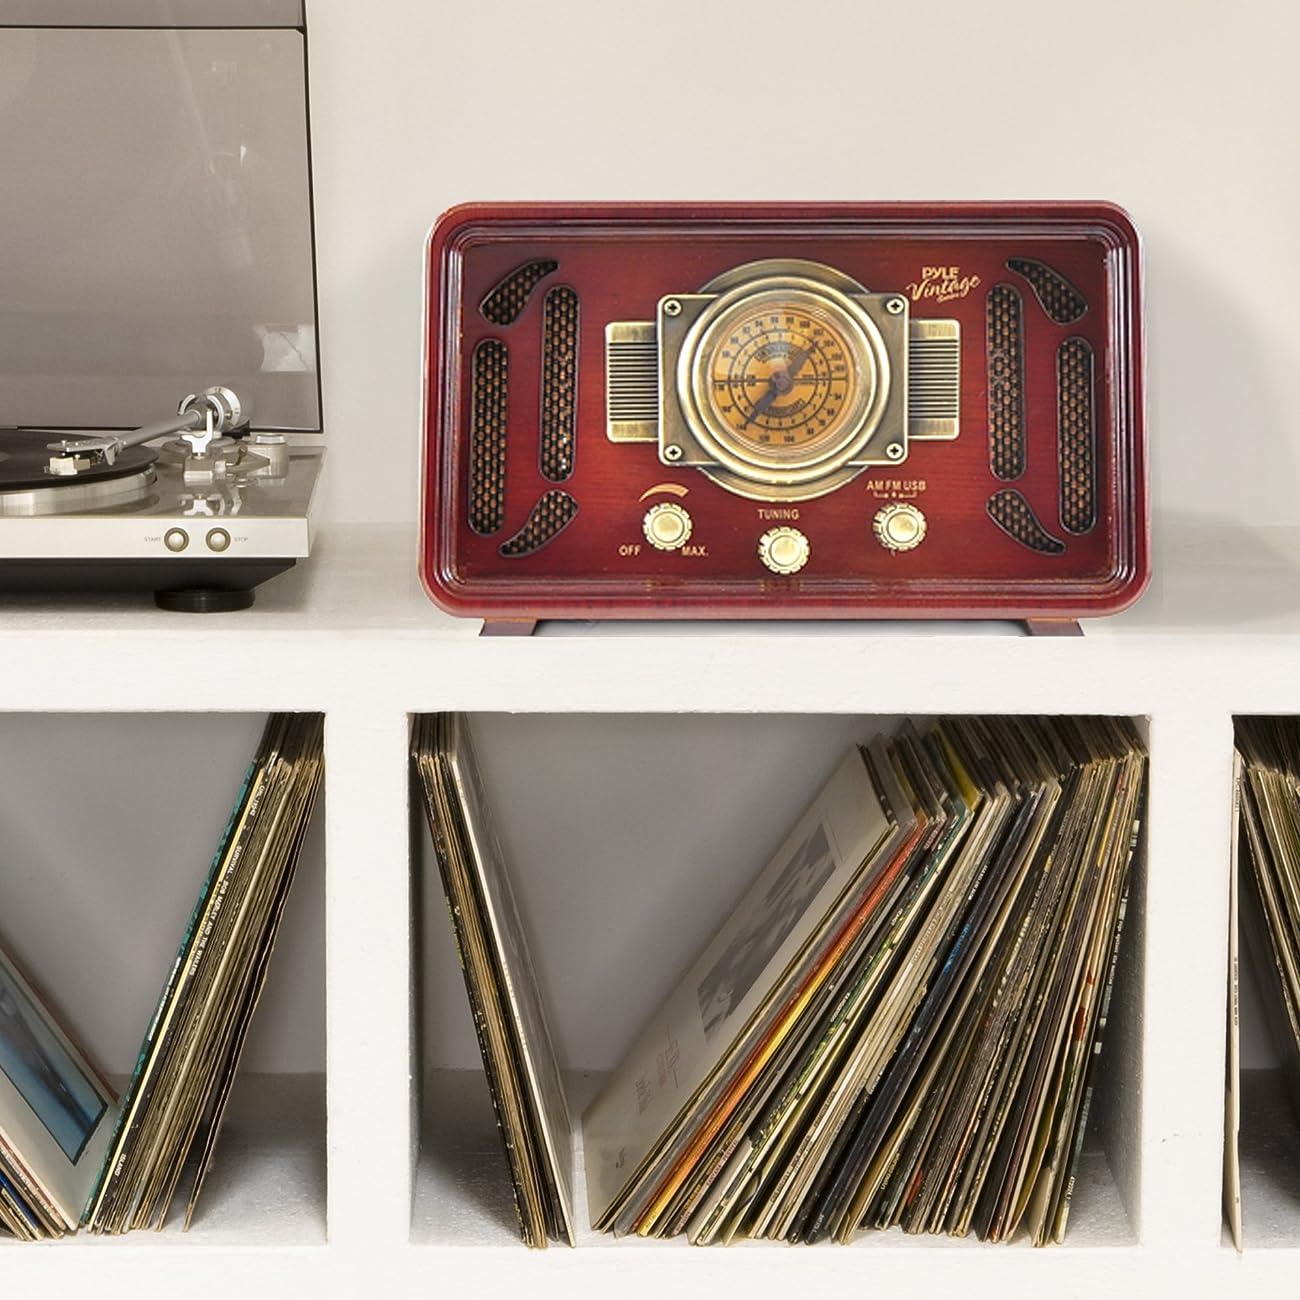 Pyle PUNP34BT Vintage Retro Classic Style Bluetooth Radio Sound System, USB/SD Readers, AM/FM Radio 5